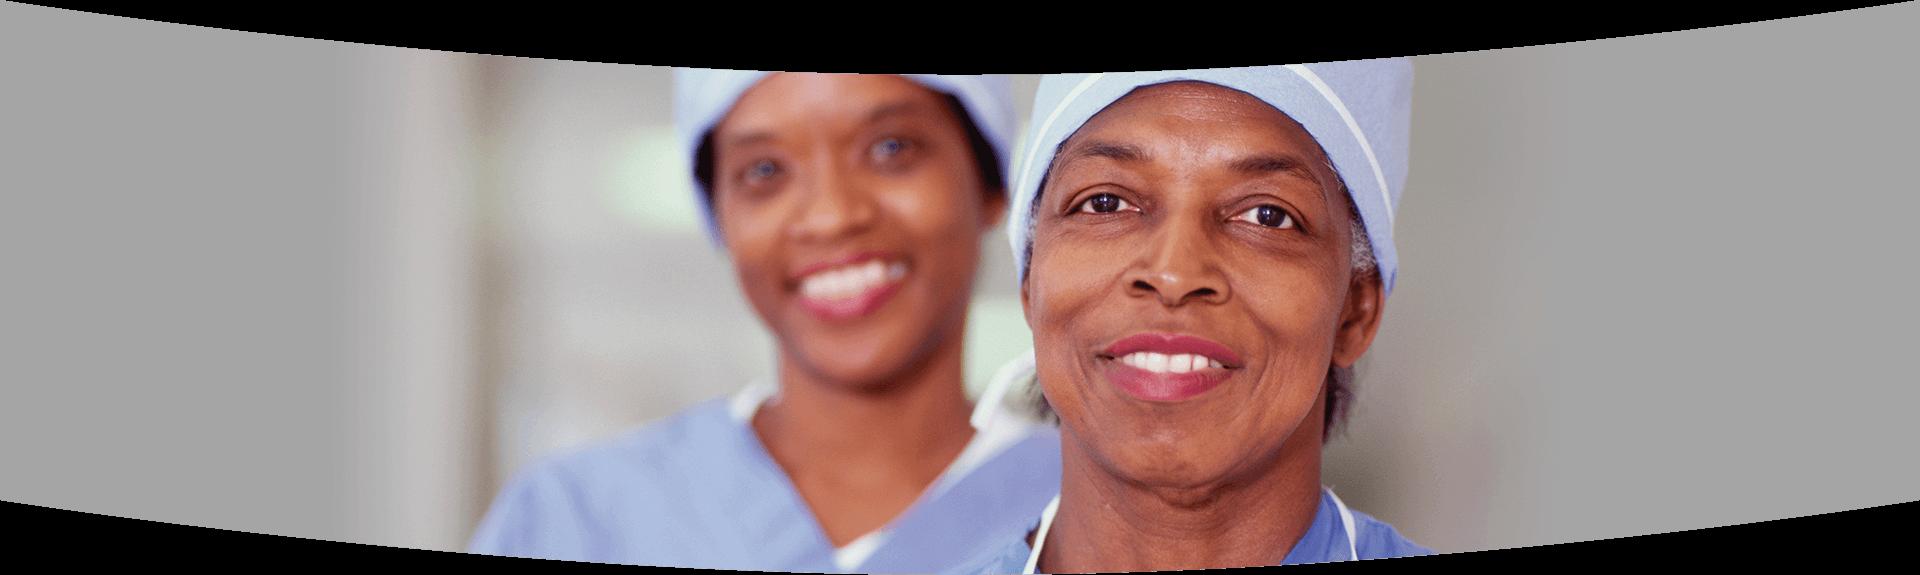 Dentist Calgary - Happy nurses